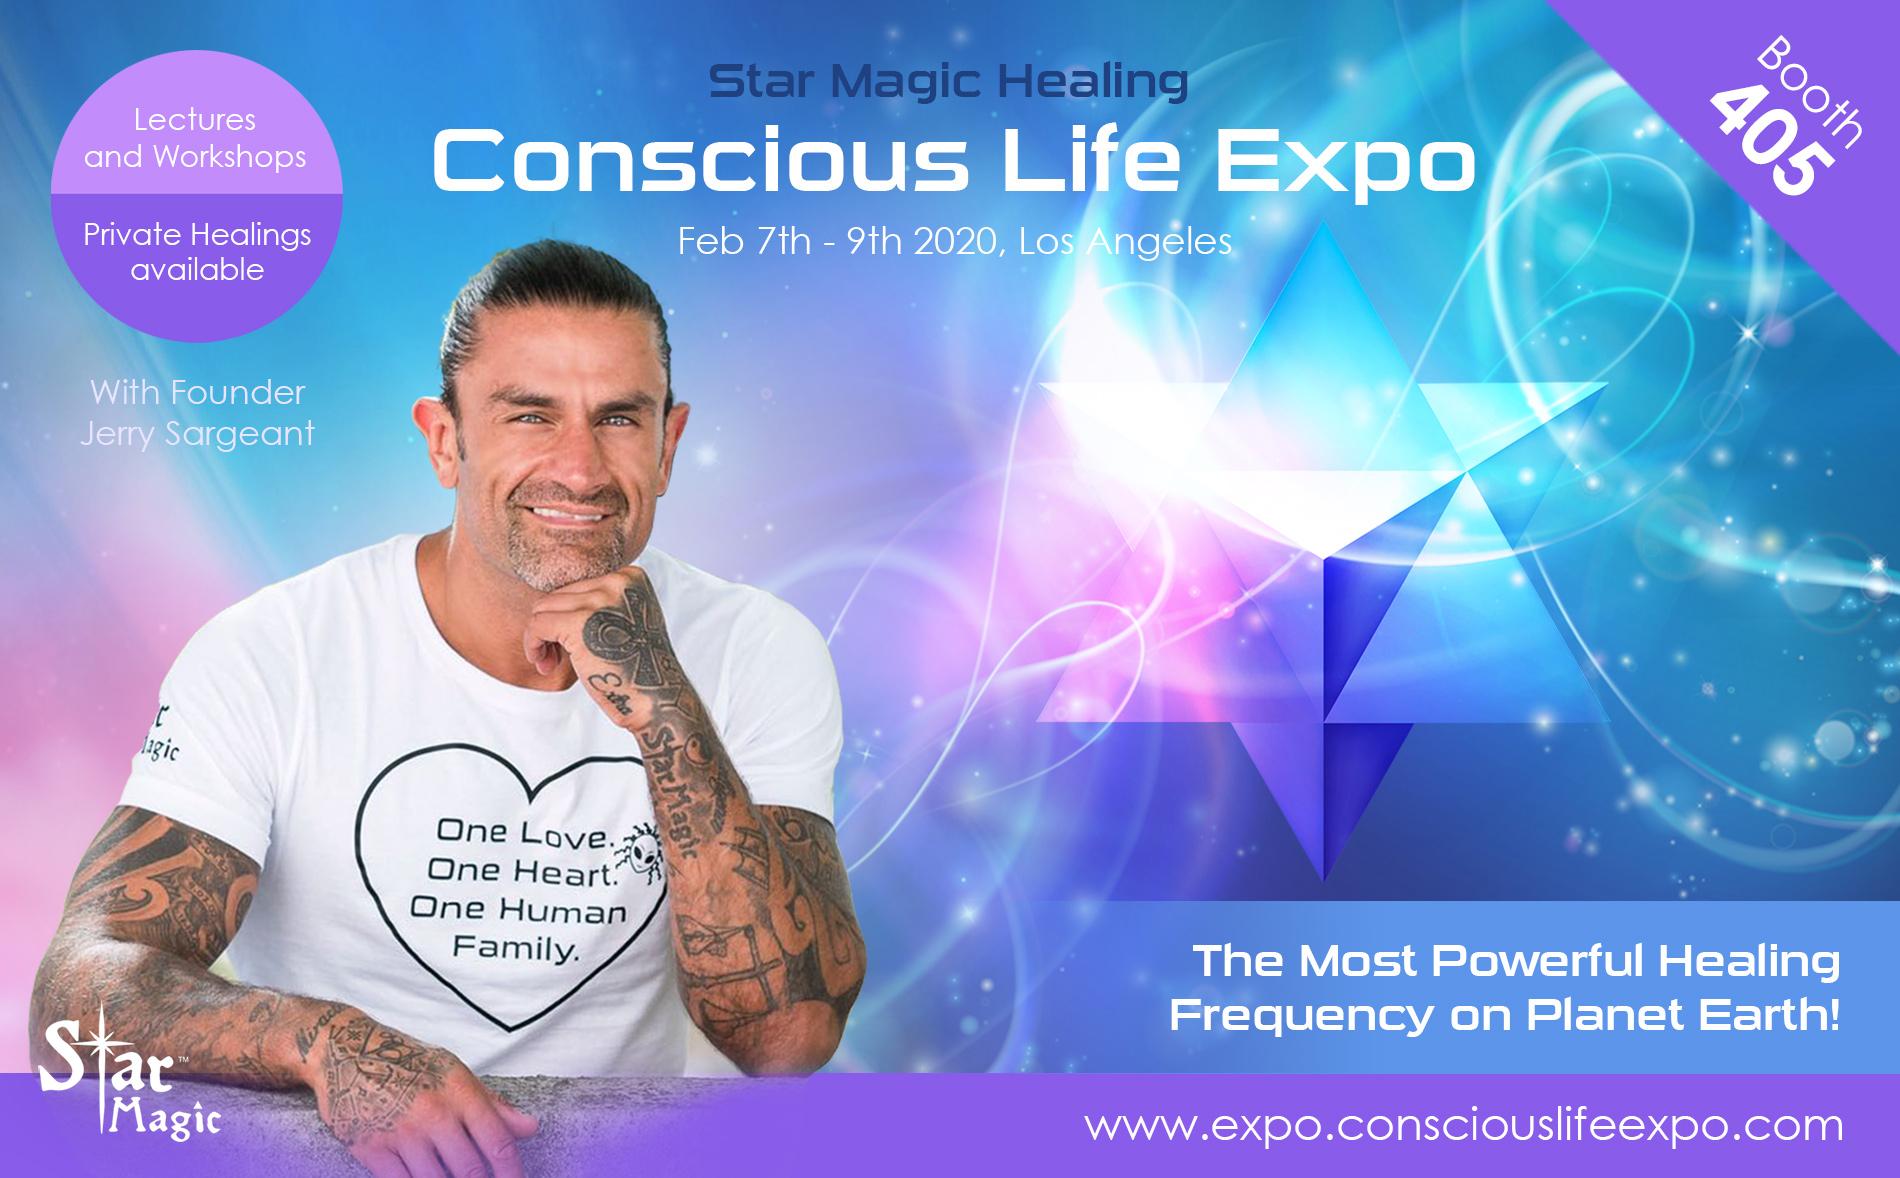 La Events February 2020.Conscious Life Expo 2020 Us Star Magic